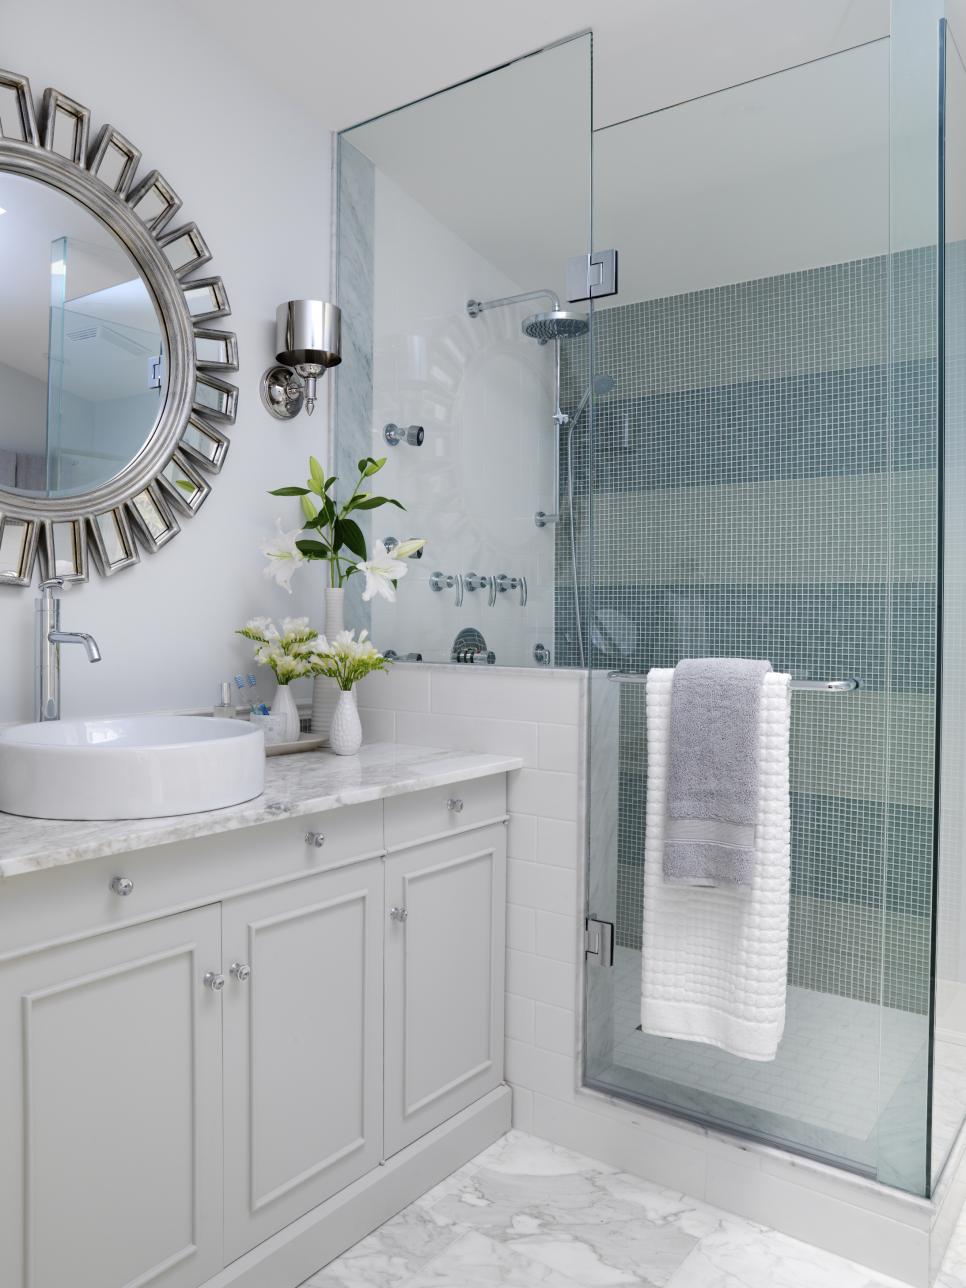 bathroom tiles 15 simply chic bathroom tile design ideas | hgtv IJQWGYK